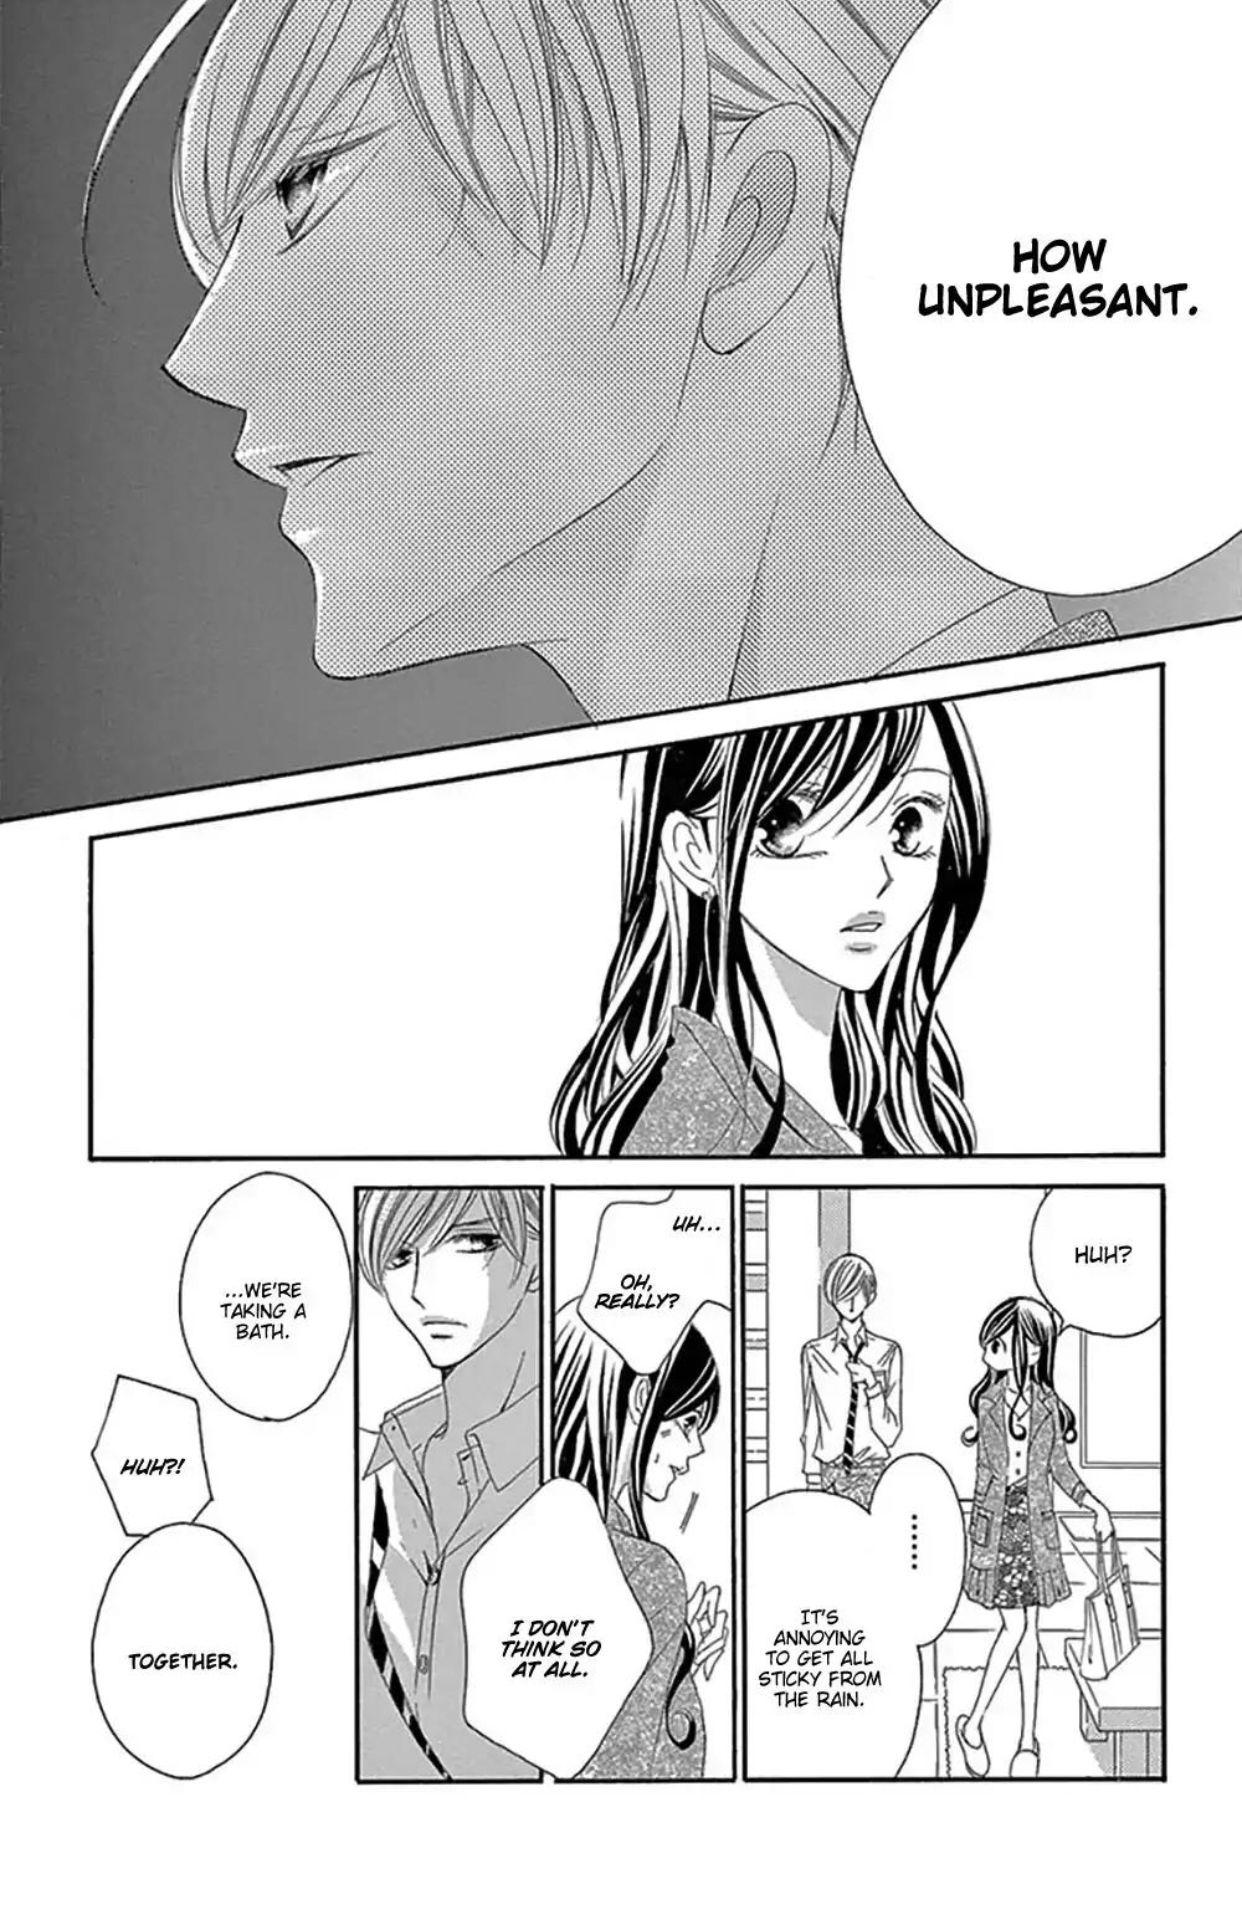 Pin By Animemangaluver On Ousama Ni Sasagu Kusuriyubi Manga